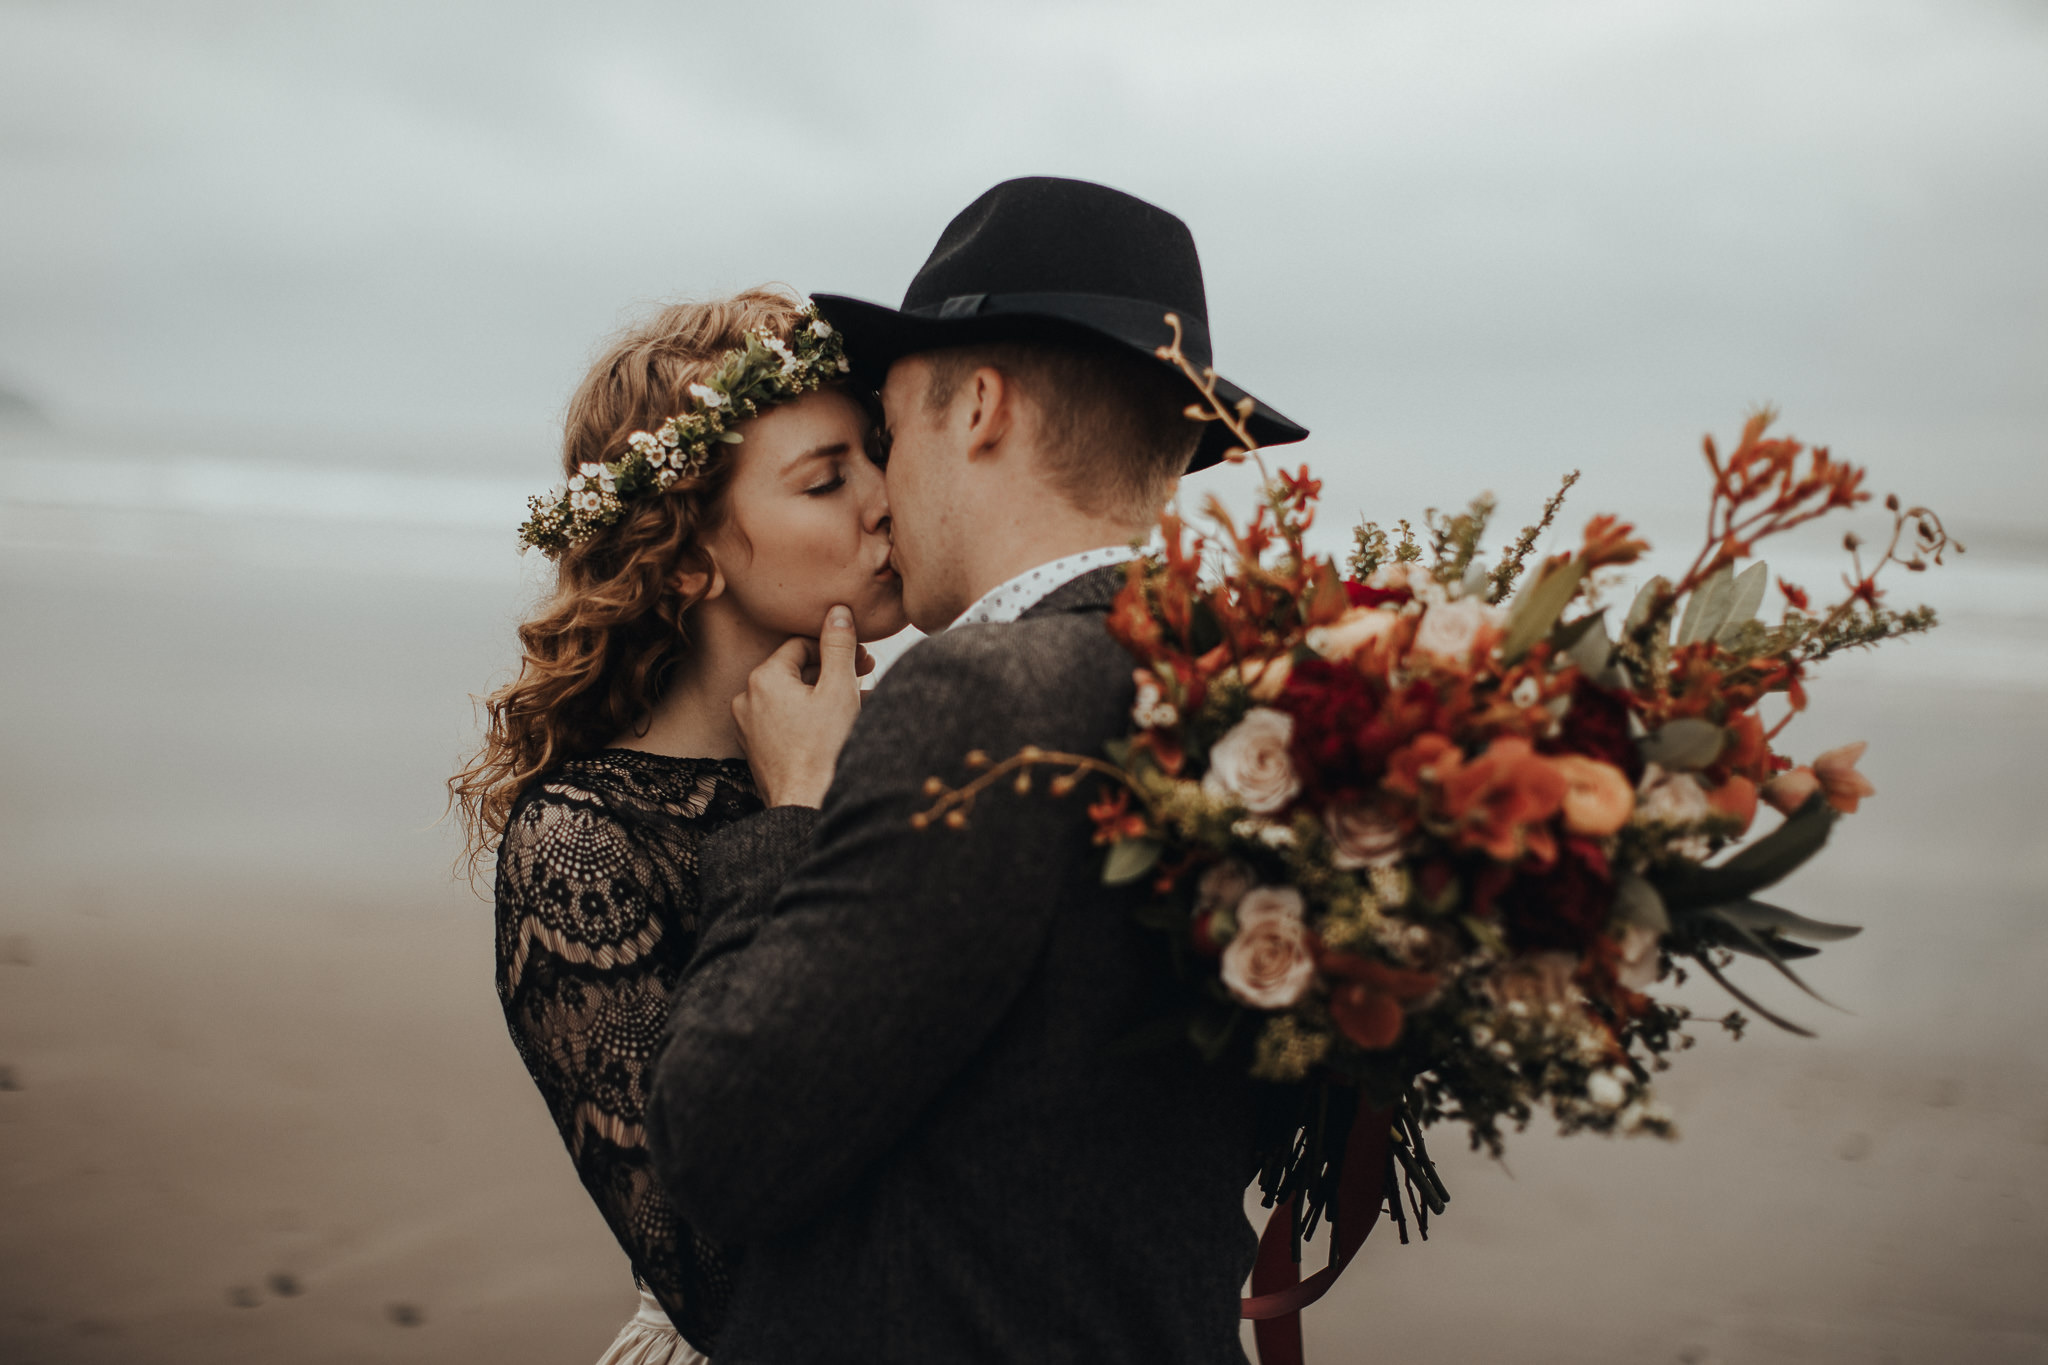 Cape Kiwanda - Elopement - Oregon - Wedding Photographer - Pat Cori Photography-13.jpg